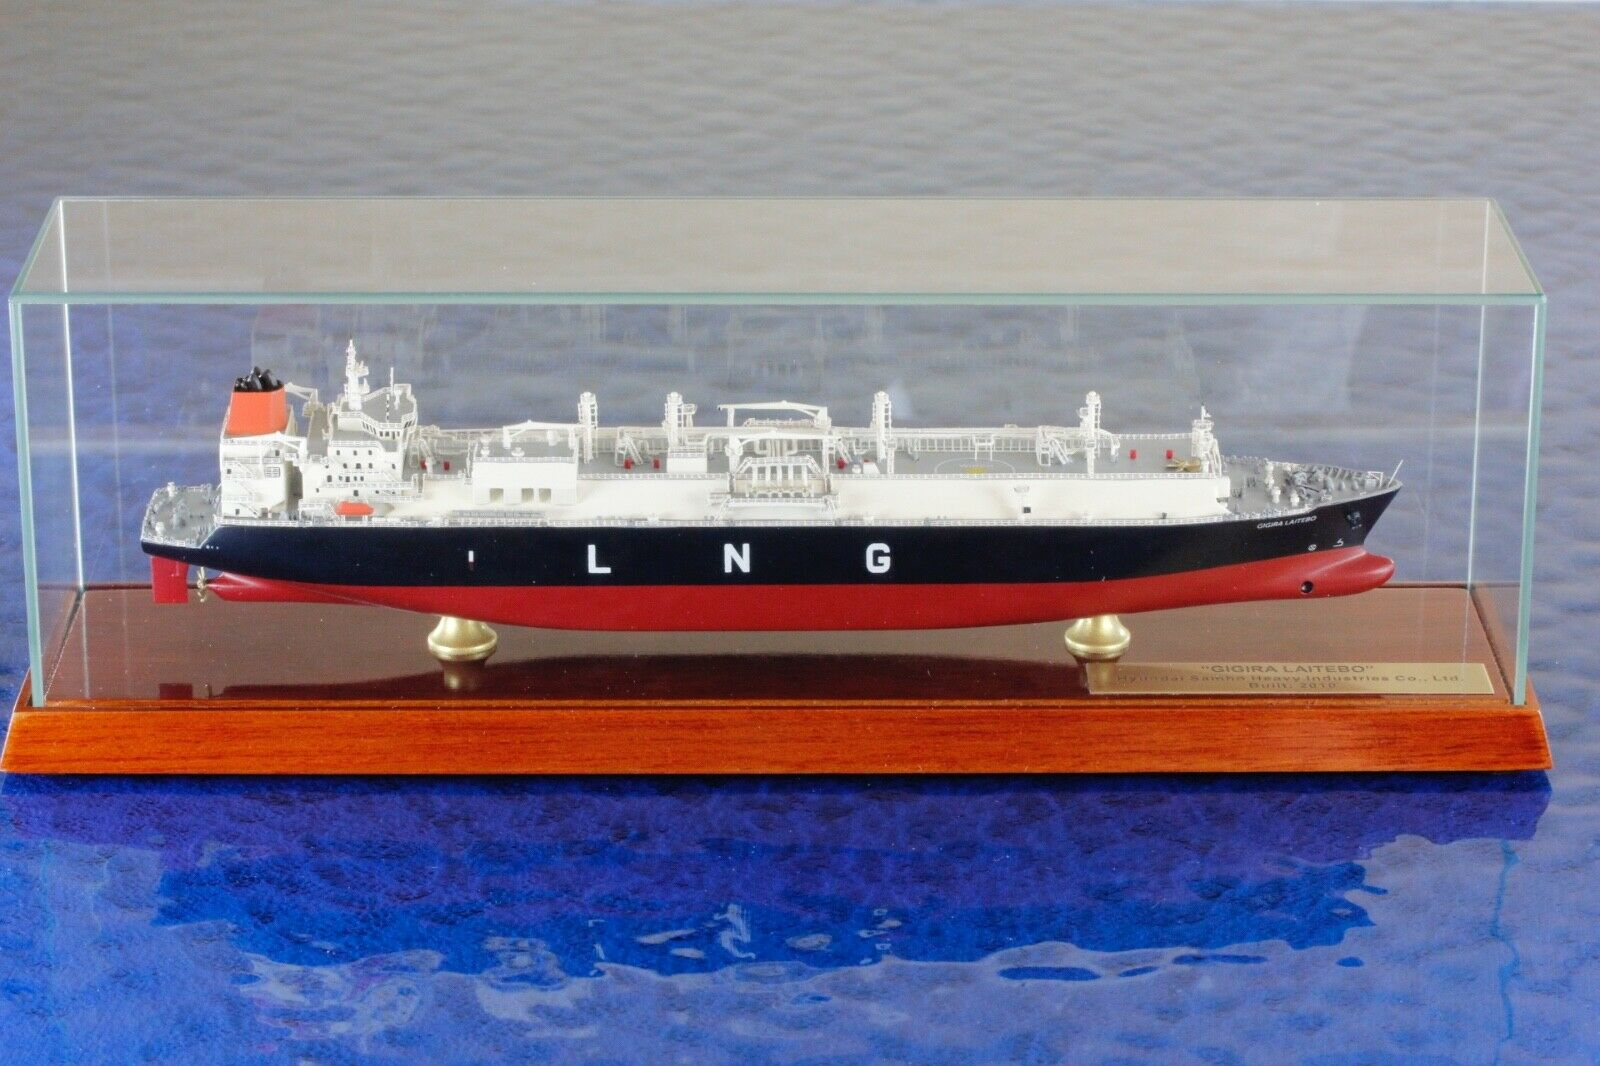 Gigira laitebo L Fabricant Classic Ship Collection 1432gvr, 1 1250 vaisseau Modèle